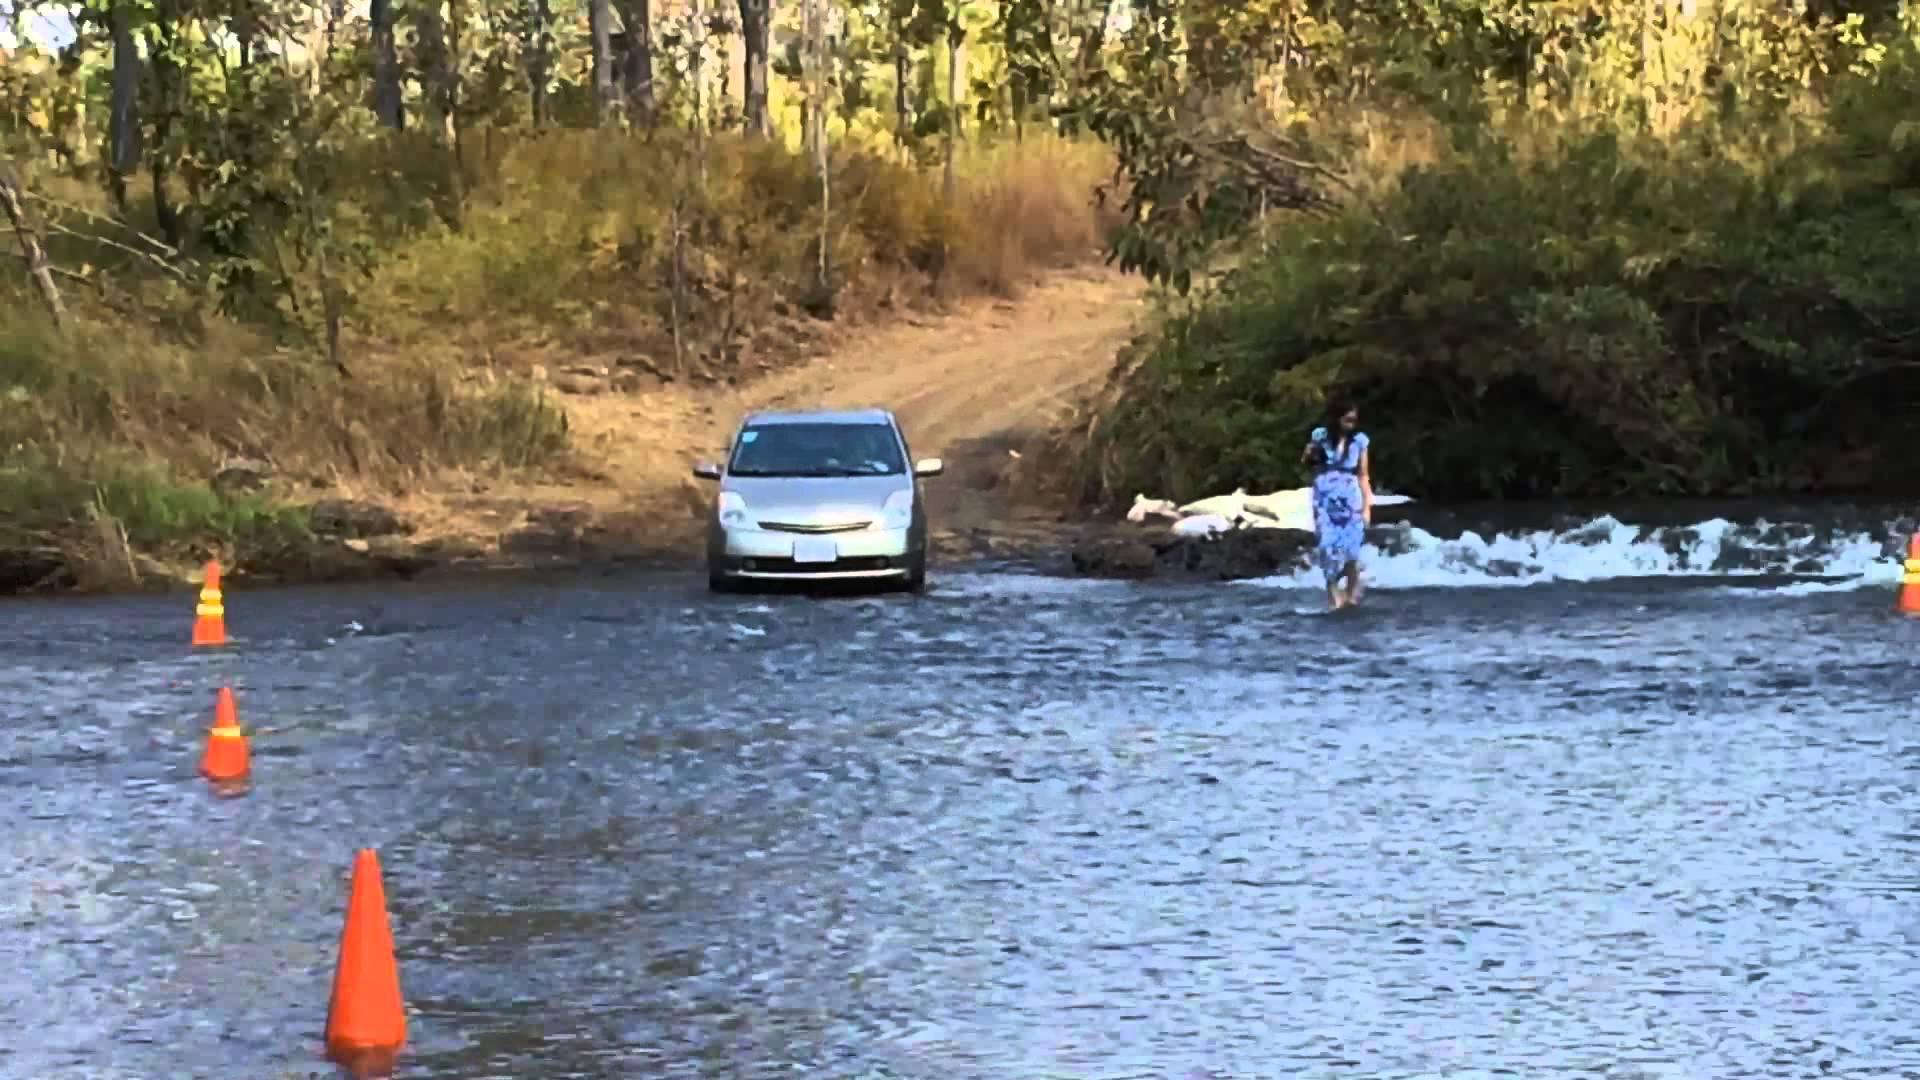 Toyota Prius cross the river - YouTube